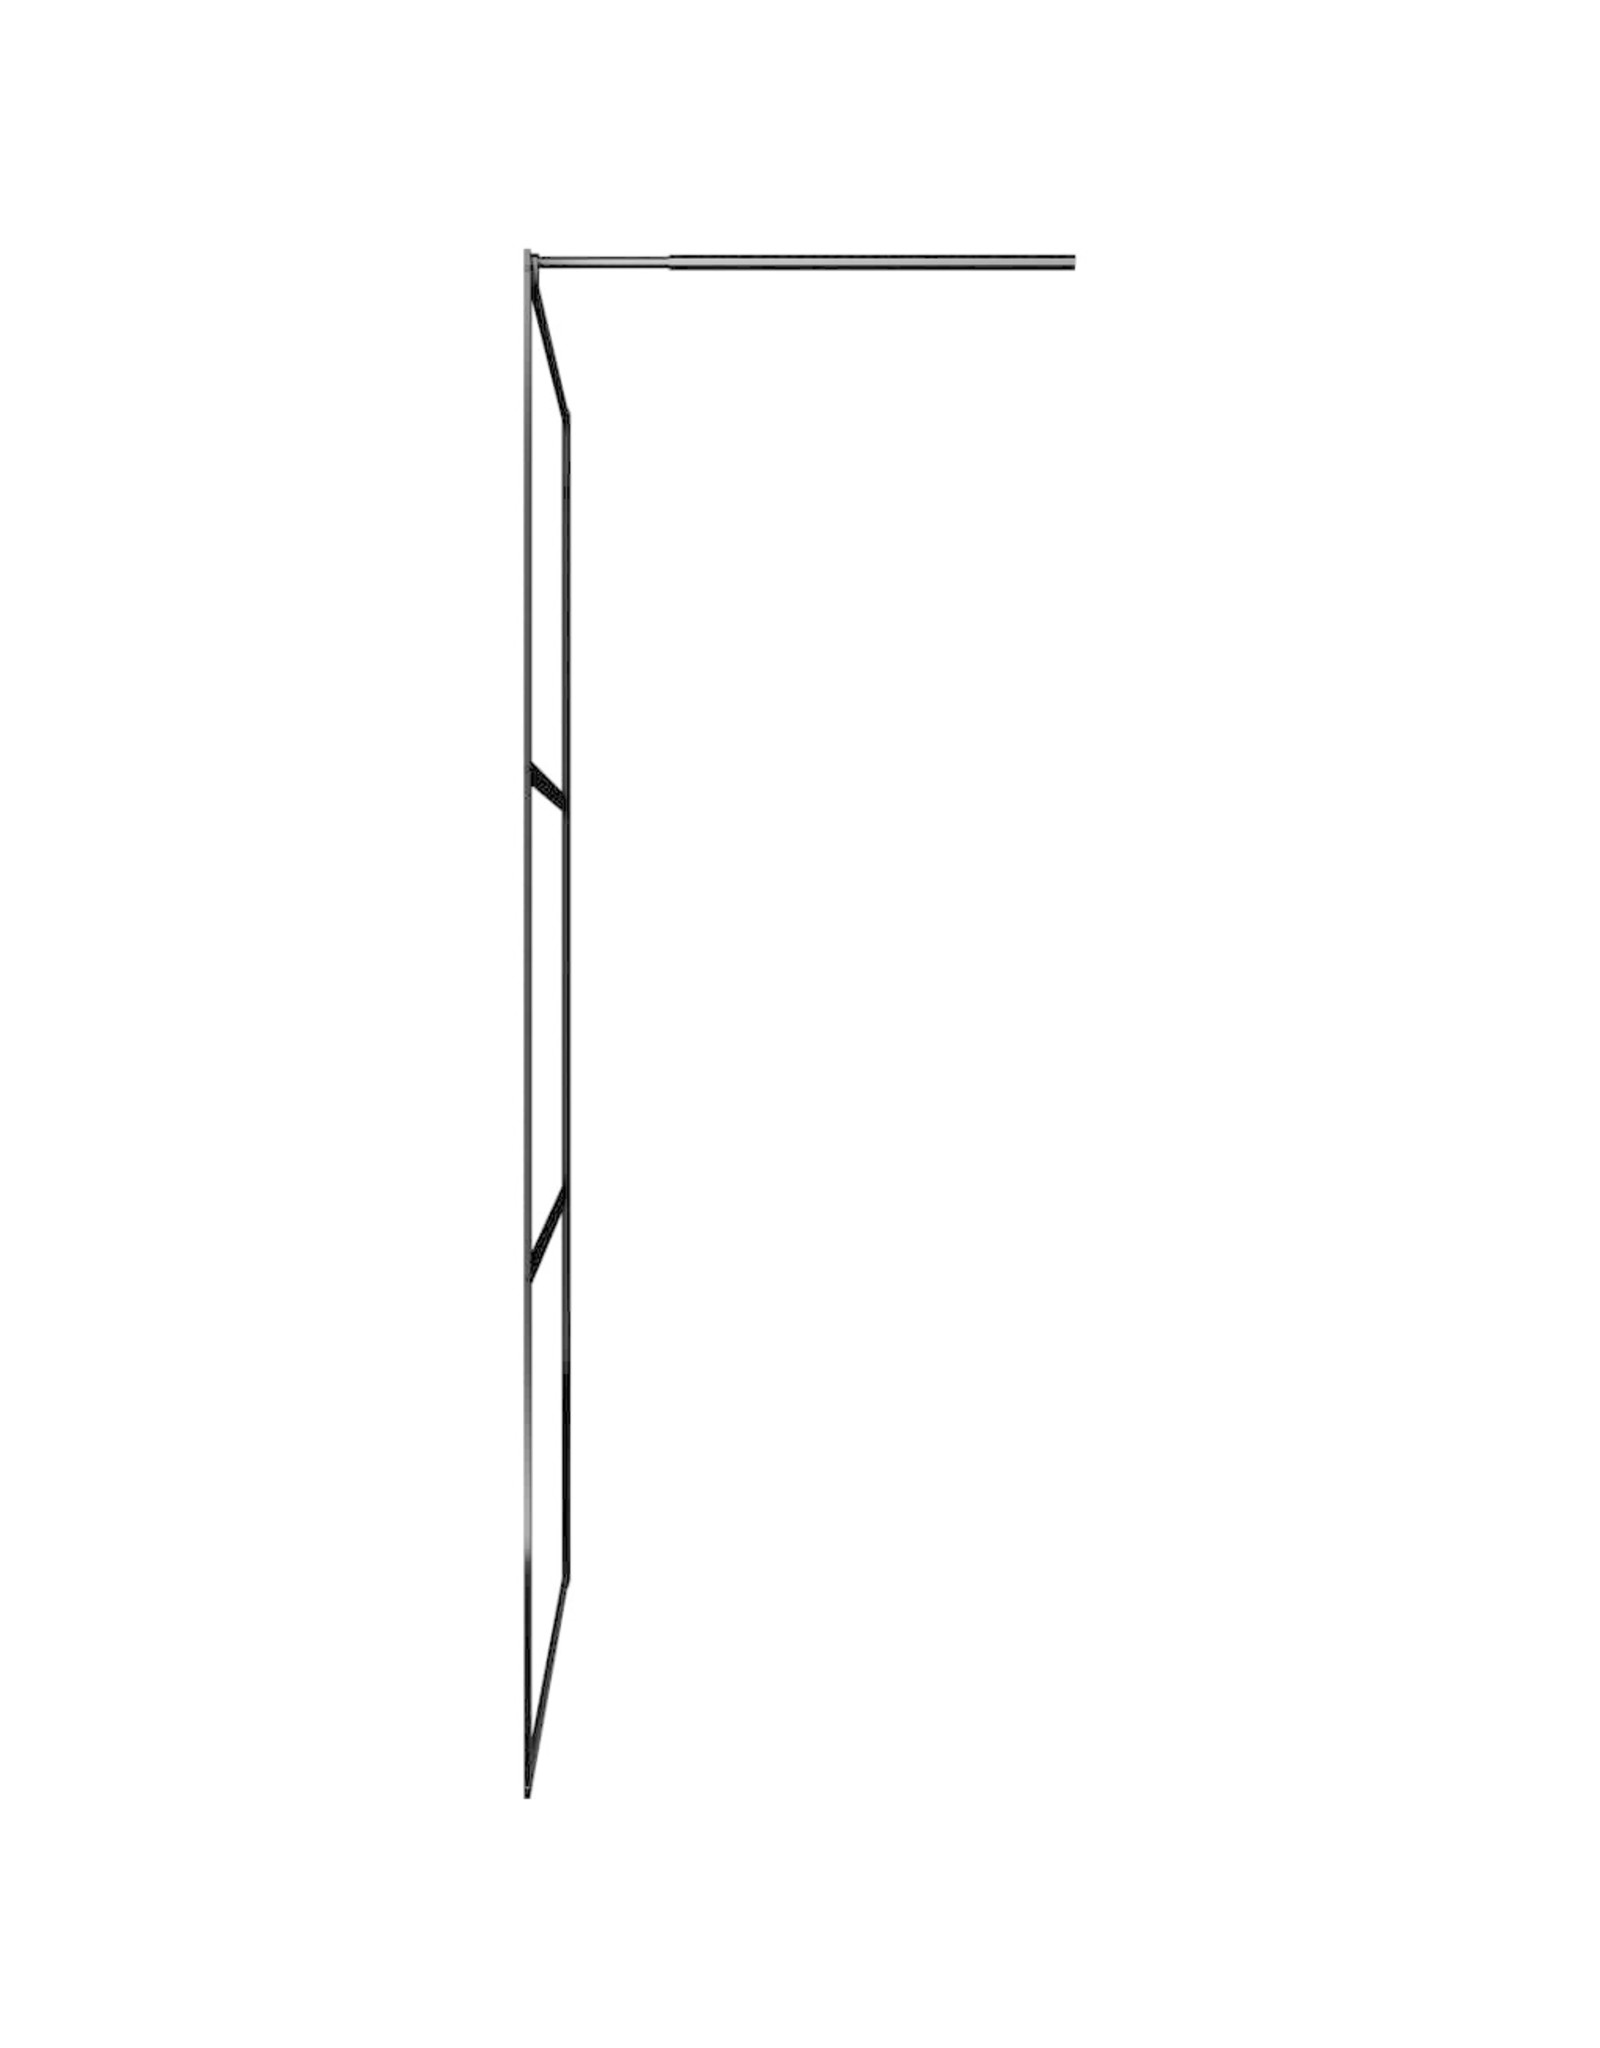 Inloopdouchewand transparant 90x195 cm ESG-glas zwart